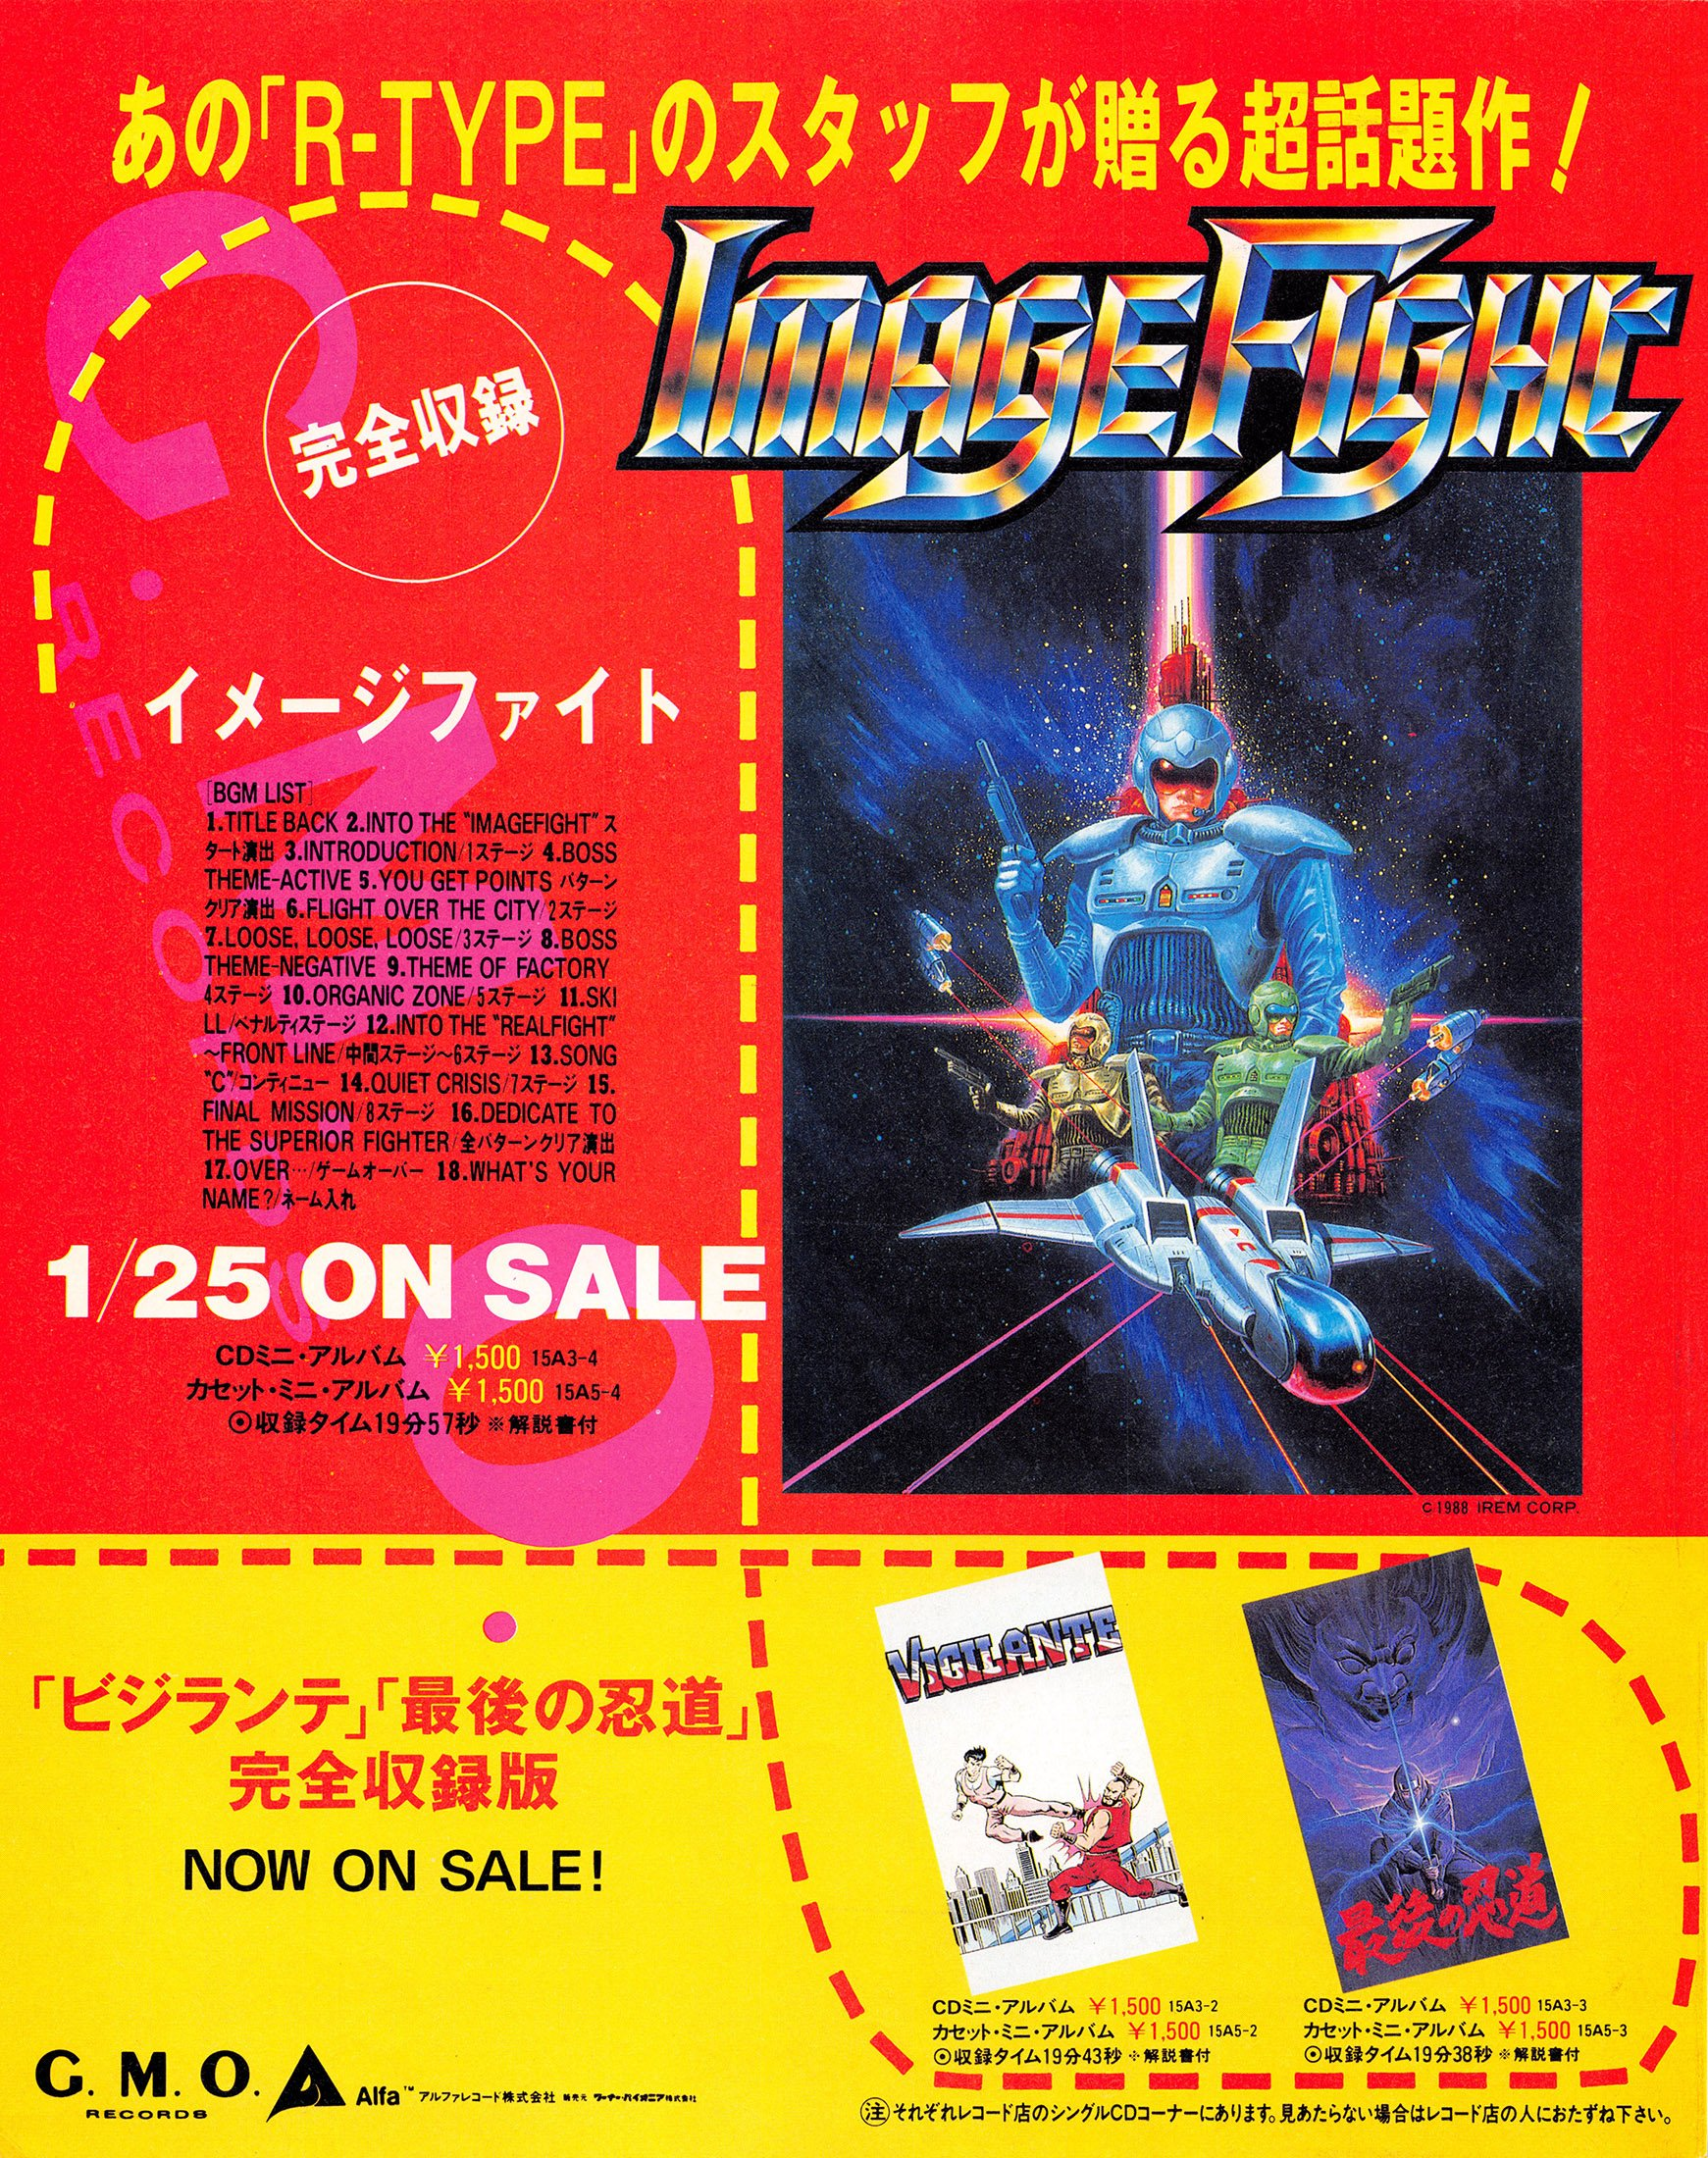 Image Fight soundtrack